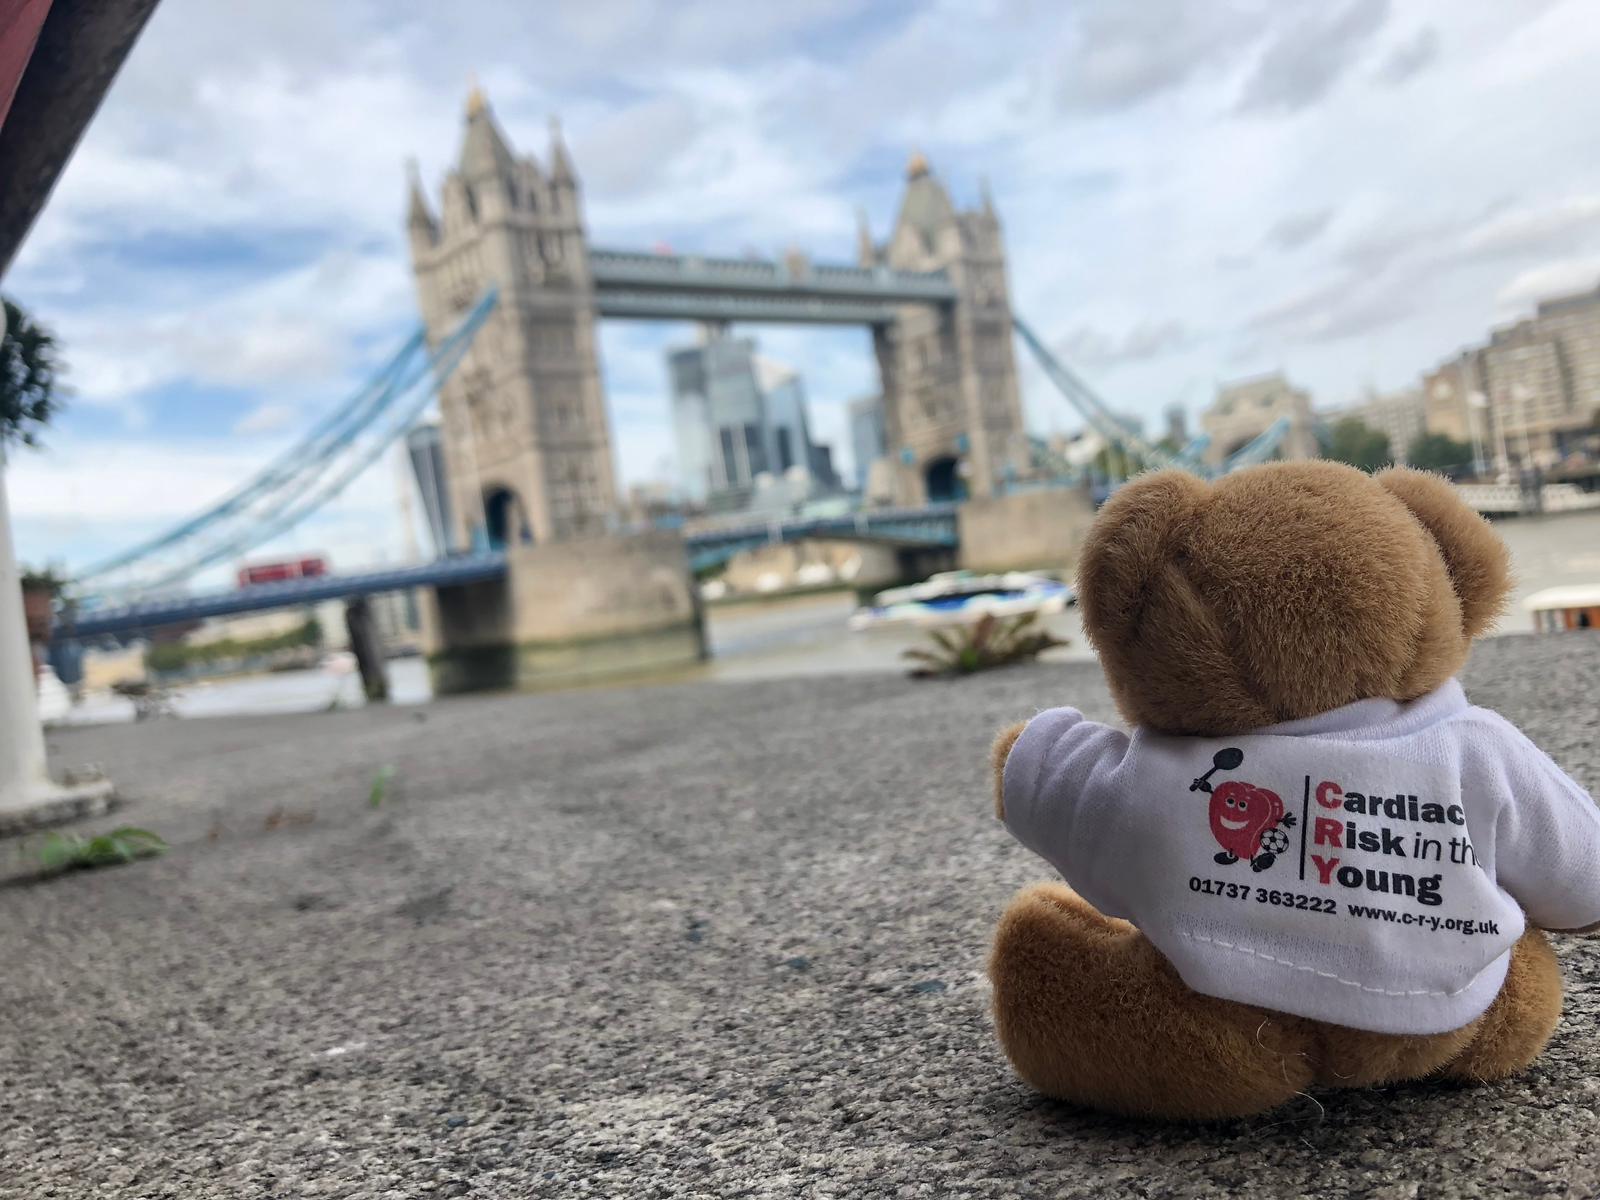 CRY Heart of London Bridges Walk